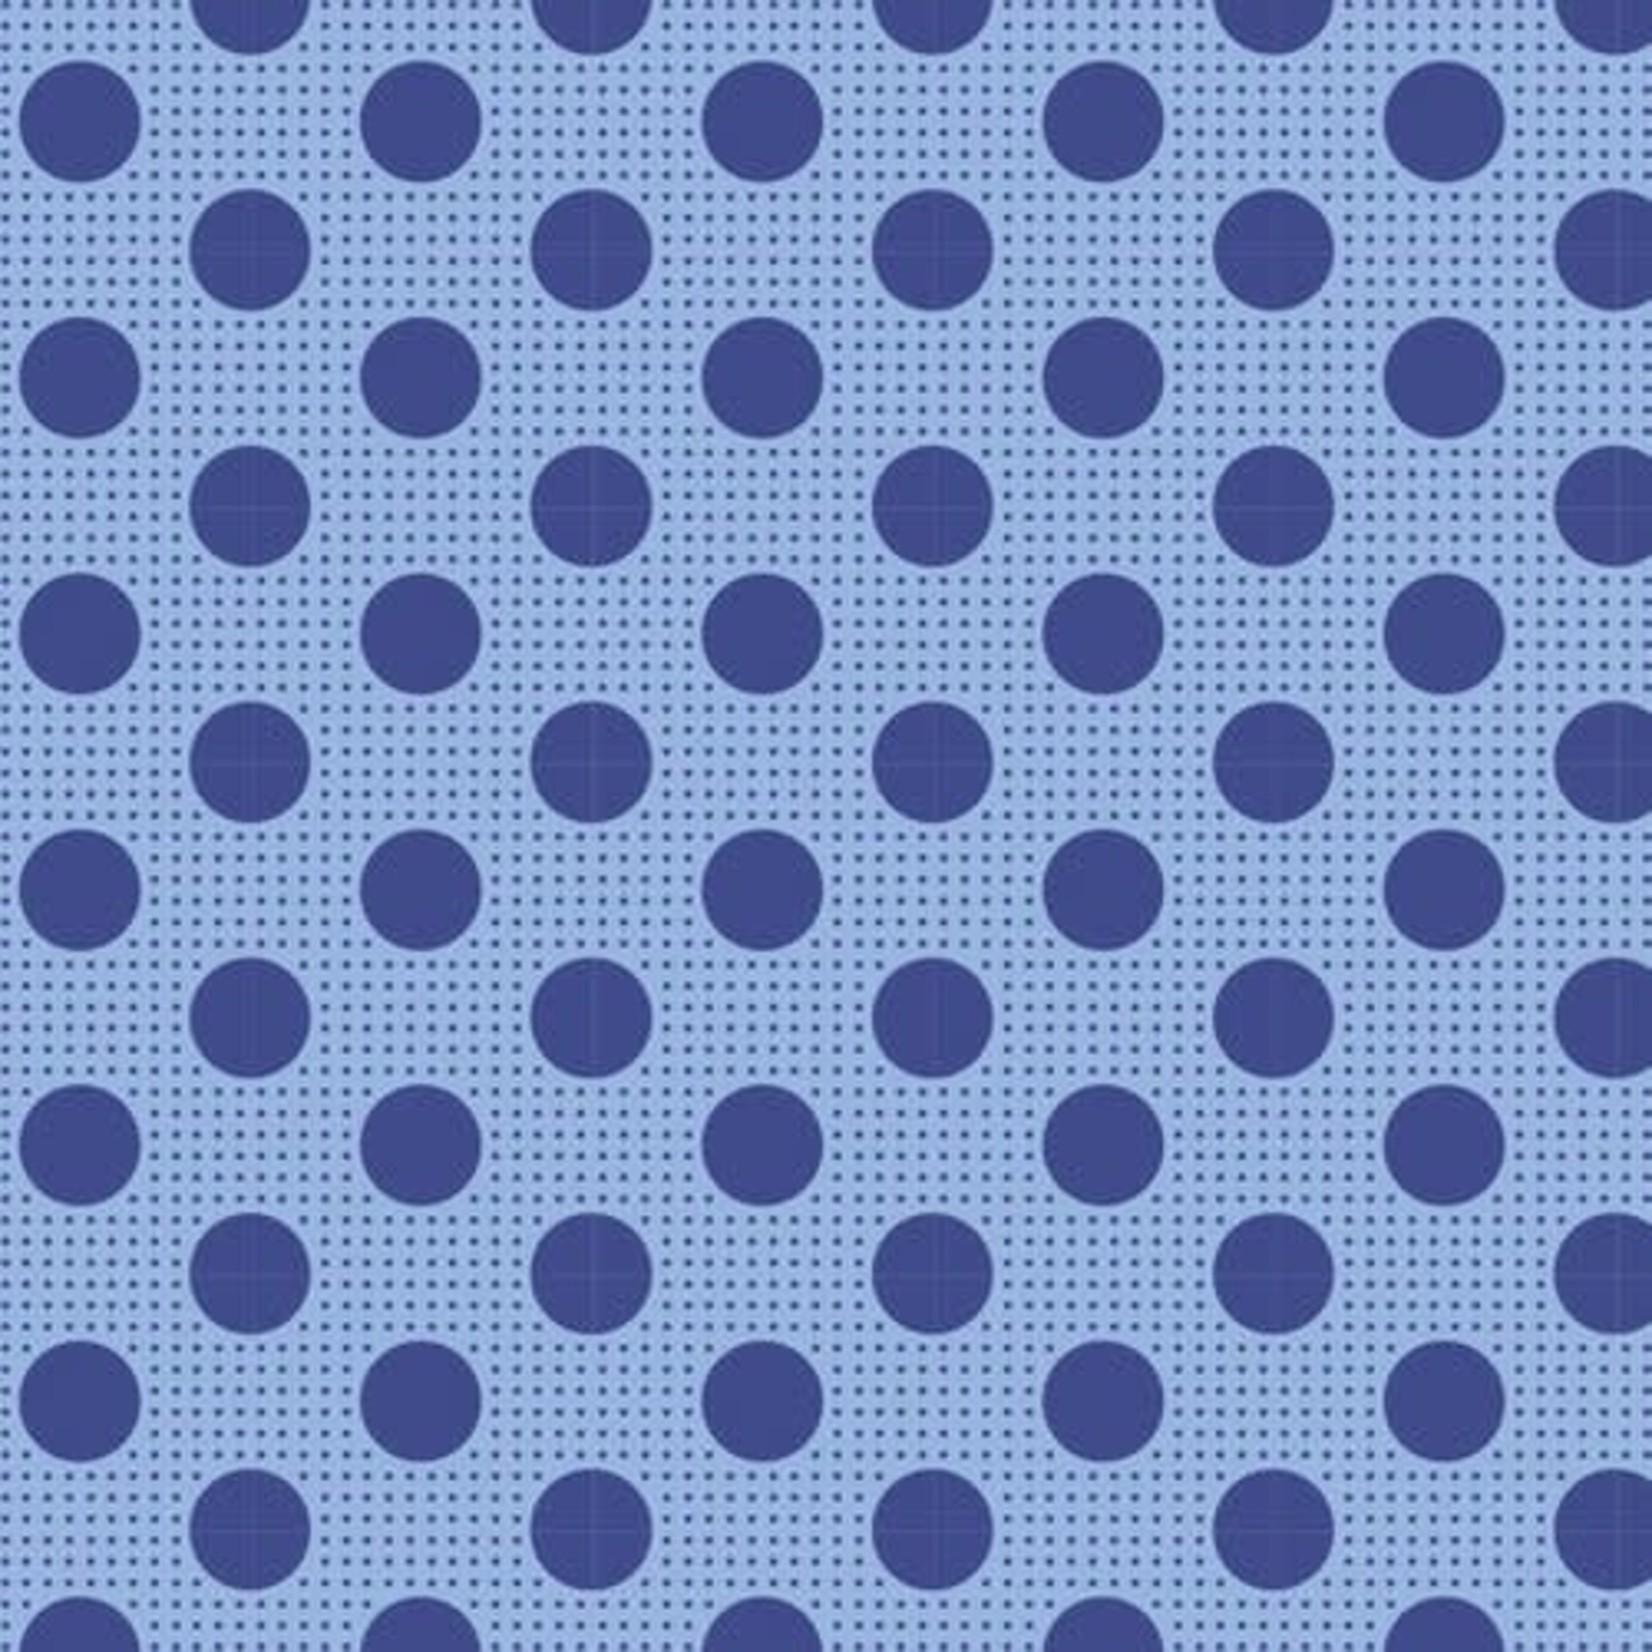 Tilda 55CM.  Tilda Basics Medium Dots, Denim Blue - per cm or $20/m